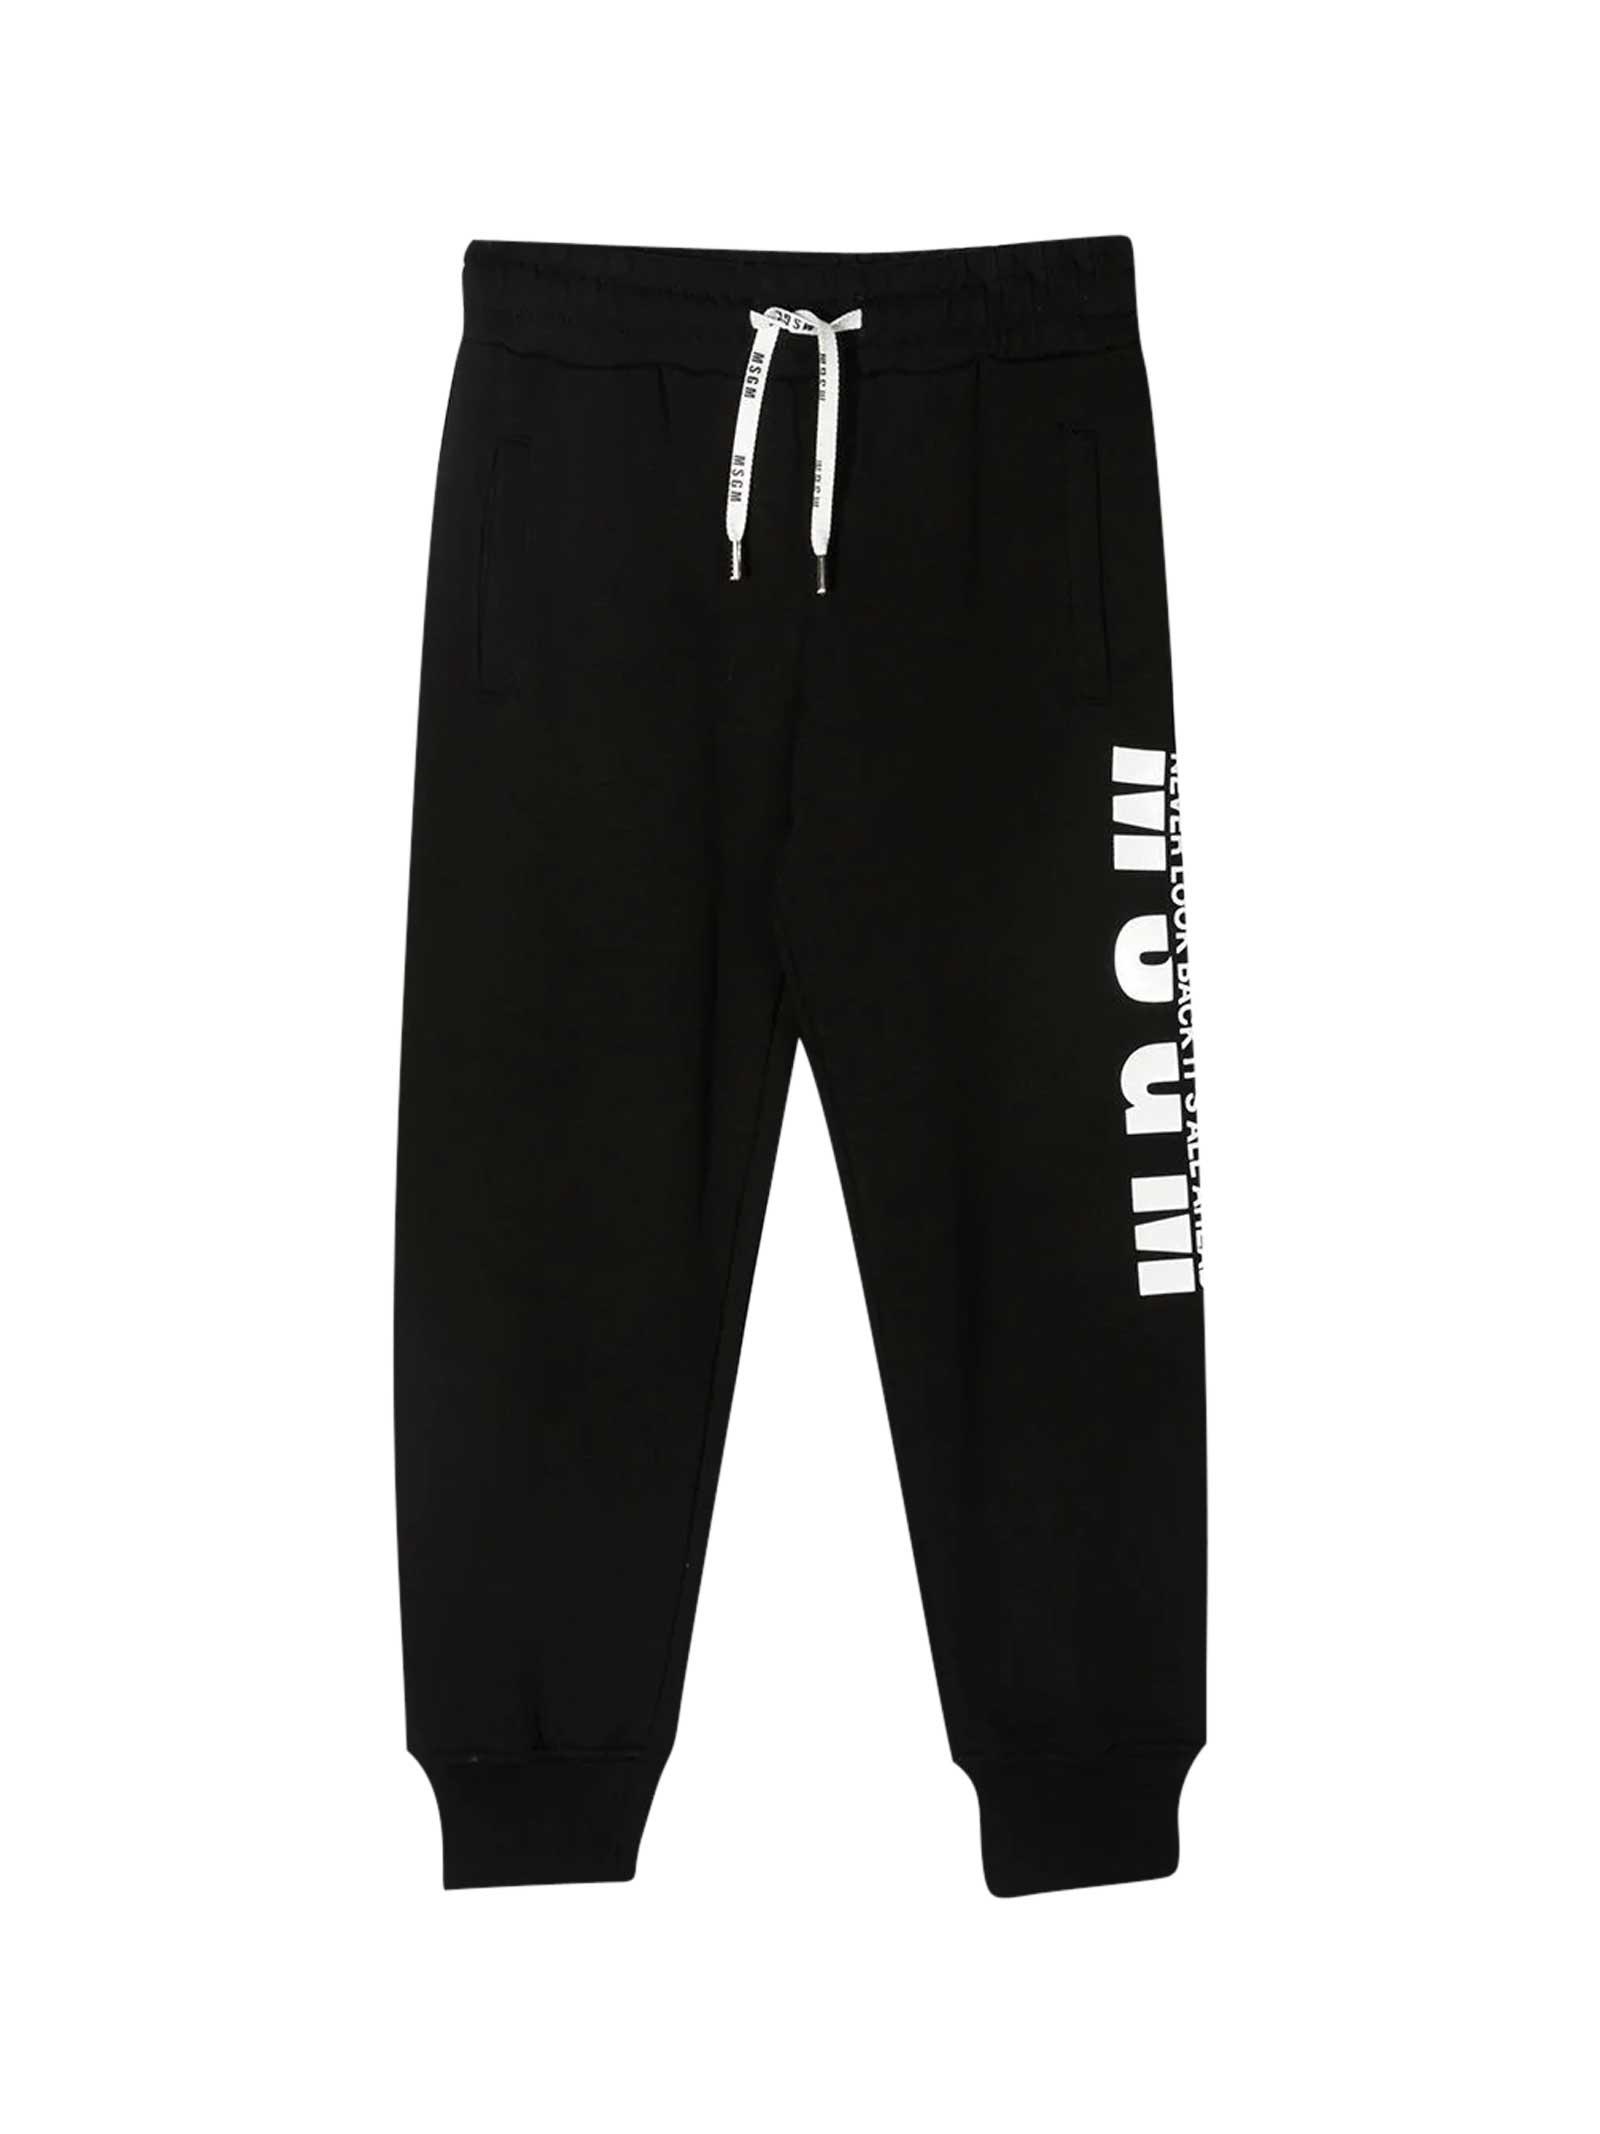 Msgm Pants BLACK JOGGERS TEEN